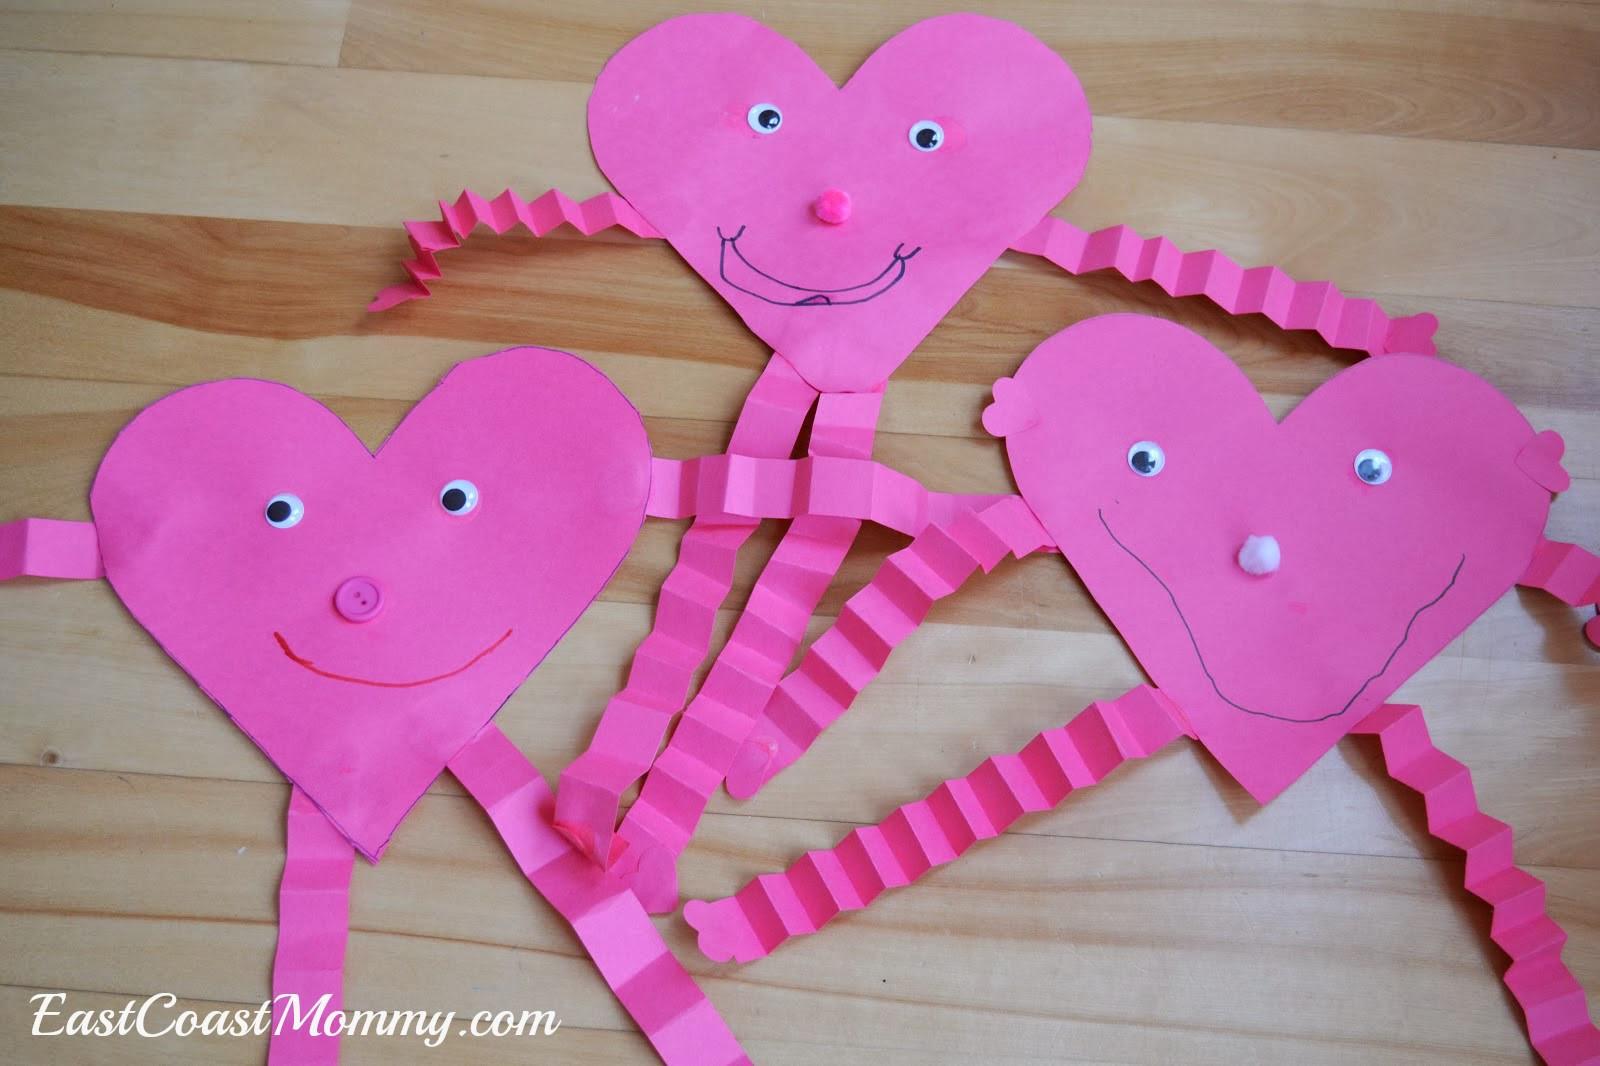 Valentine Craft Preschoolers  12 Easy Valentine Crafts for Toddlers & Preschoolers You